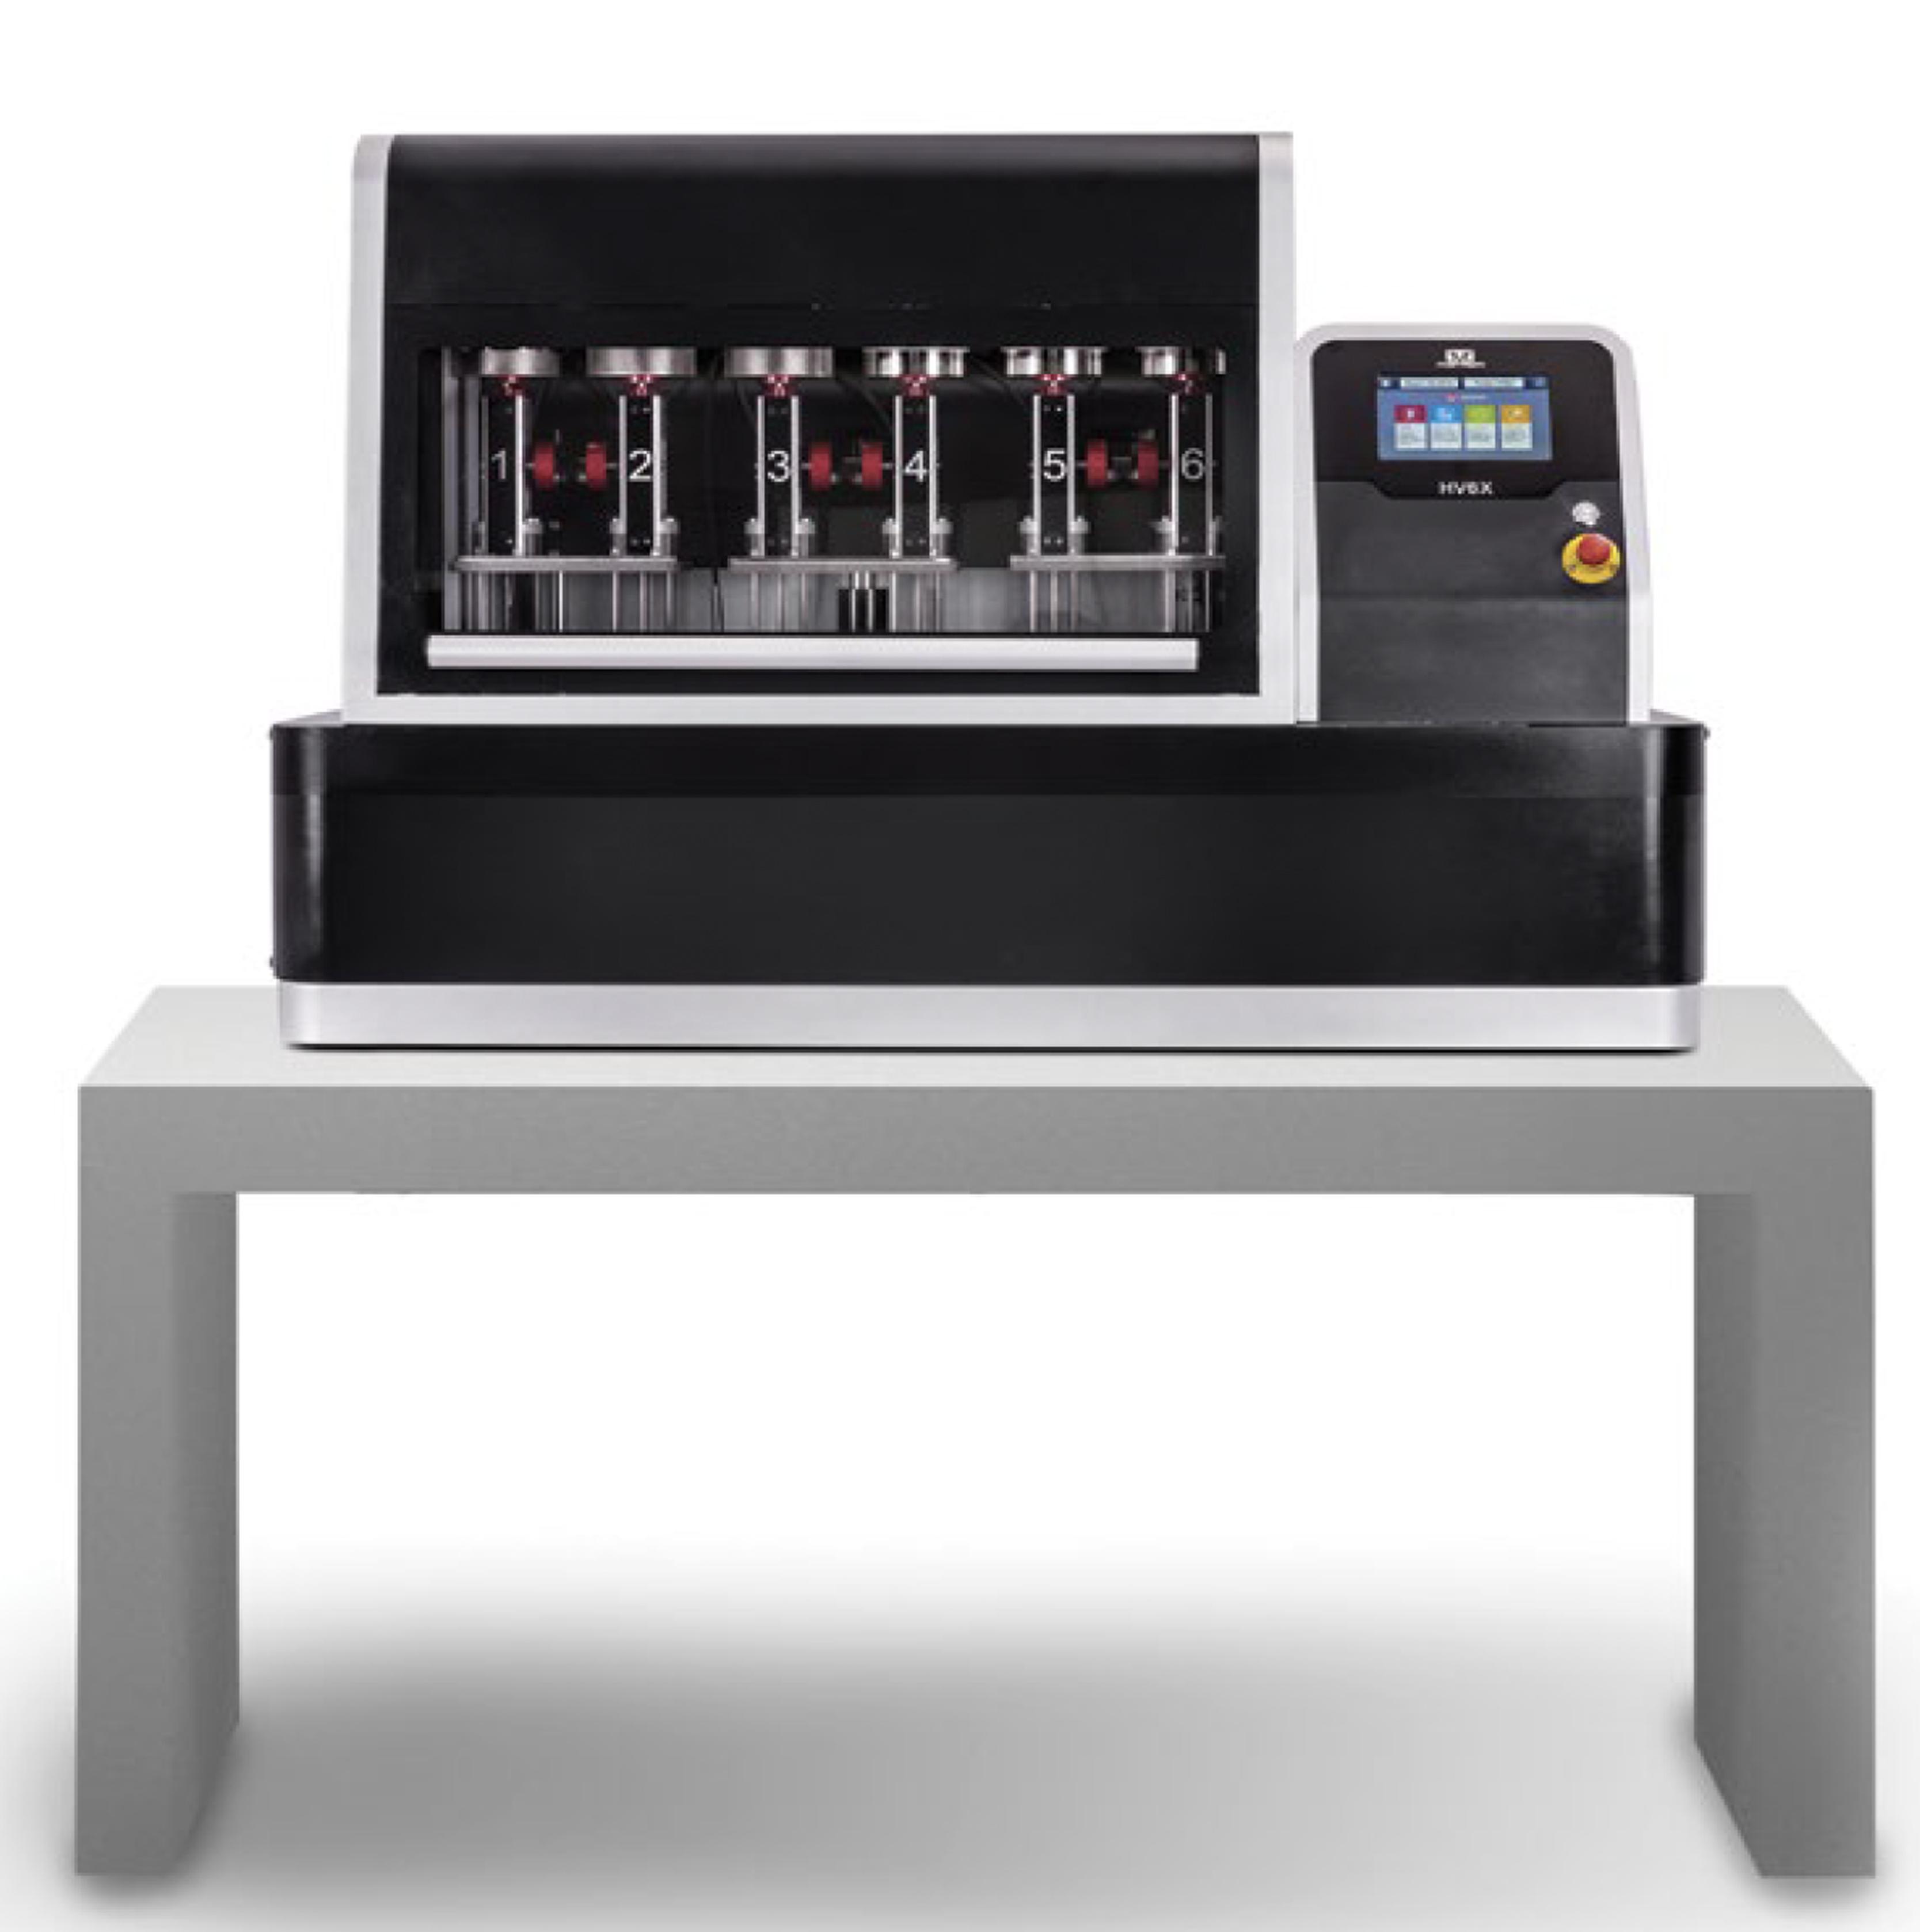 Probador de HDT y Vicat HV 6X HDT